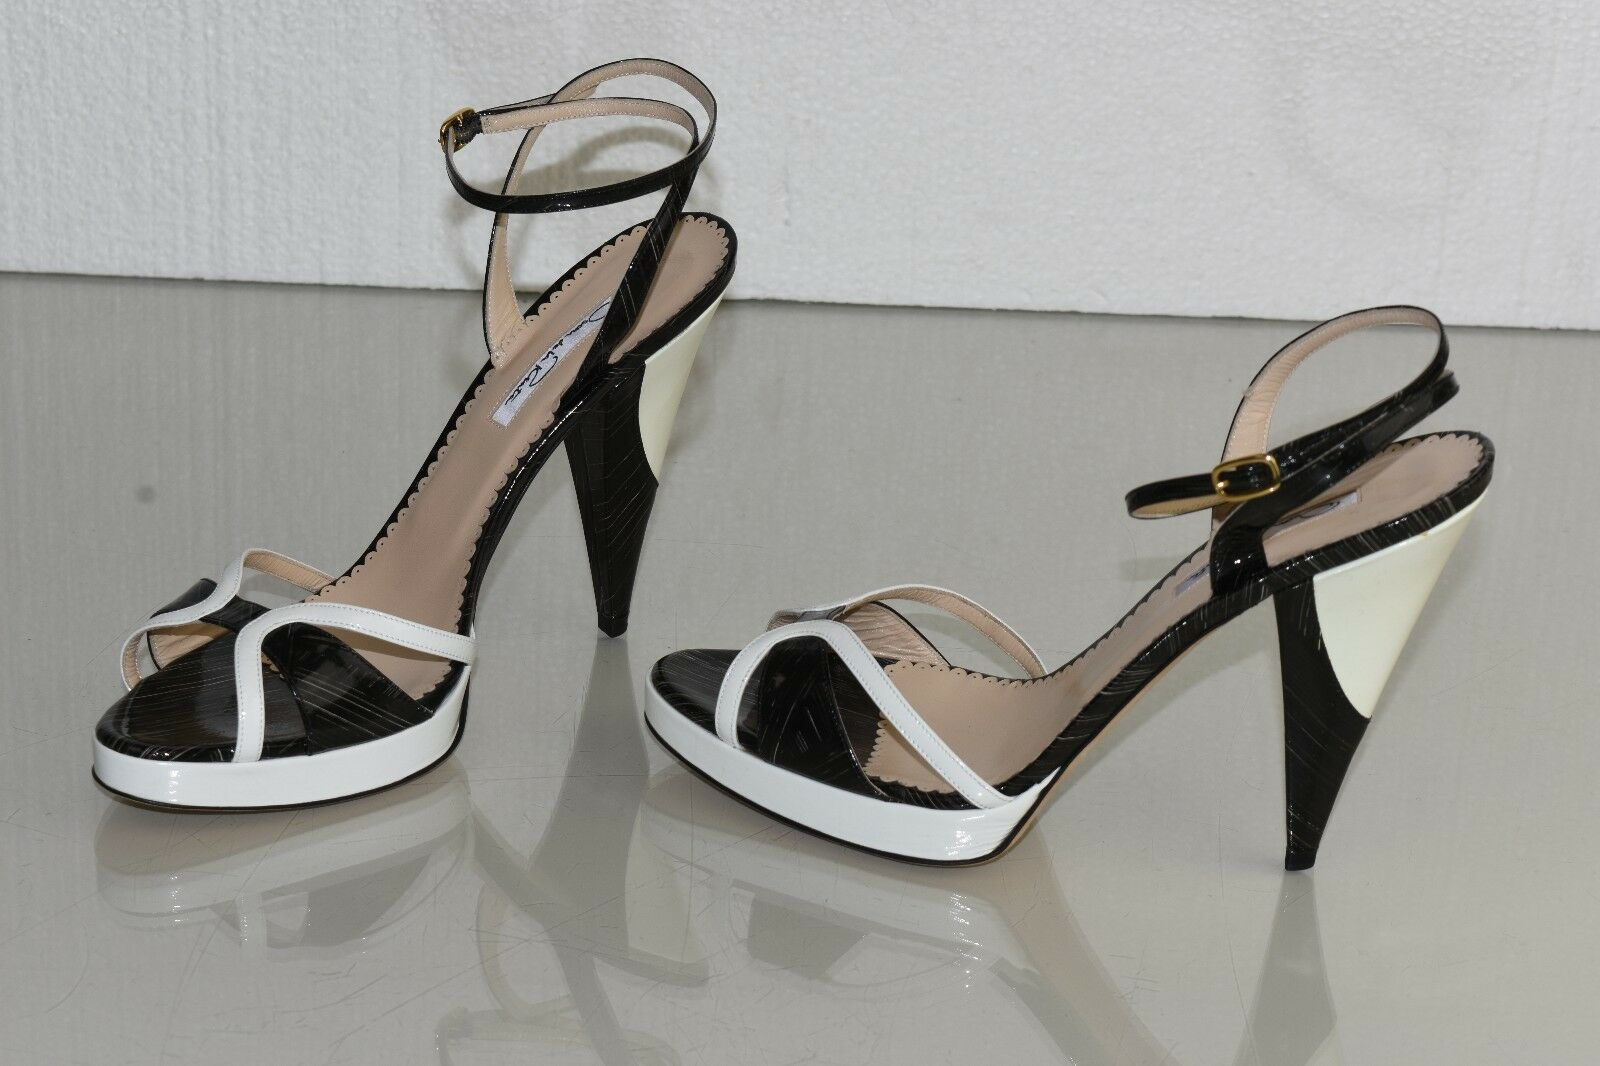 Neu Oscar De La Renta Plateau Lackleder Schwarz Weiß Sandalen Schuh 40.5